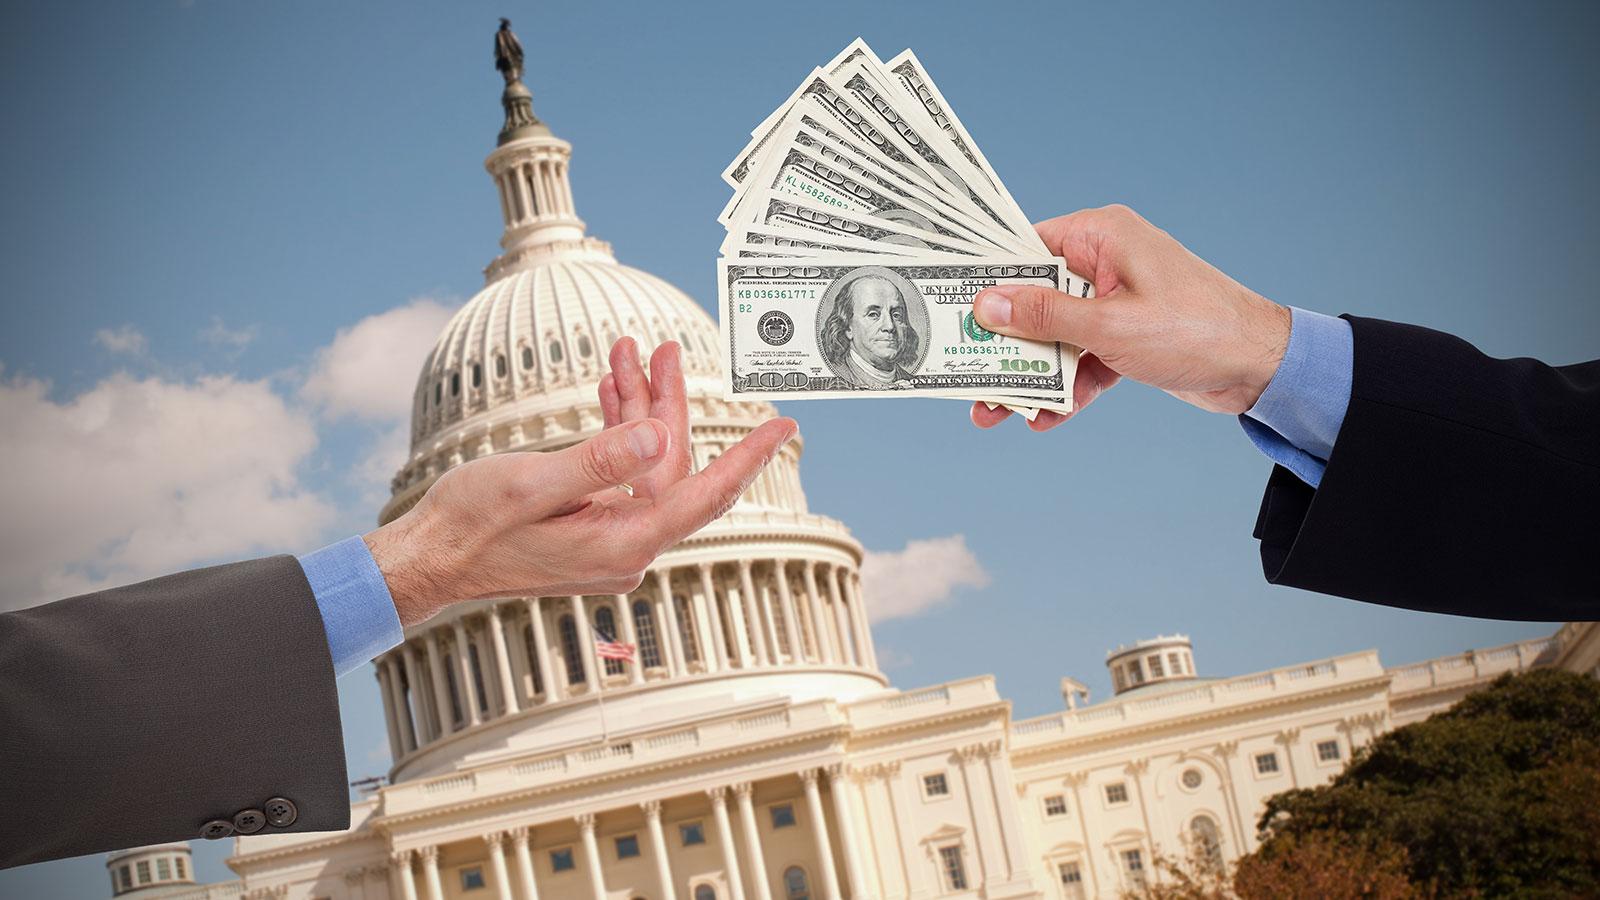 money handoff in front of Capitol